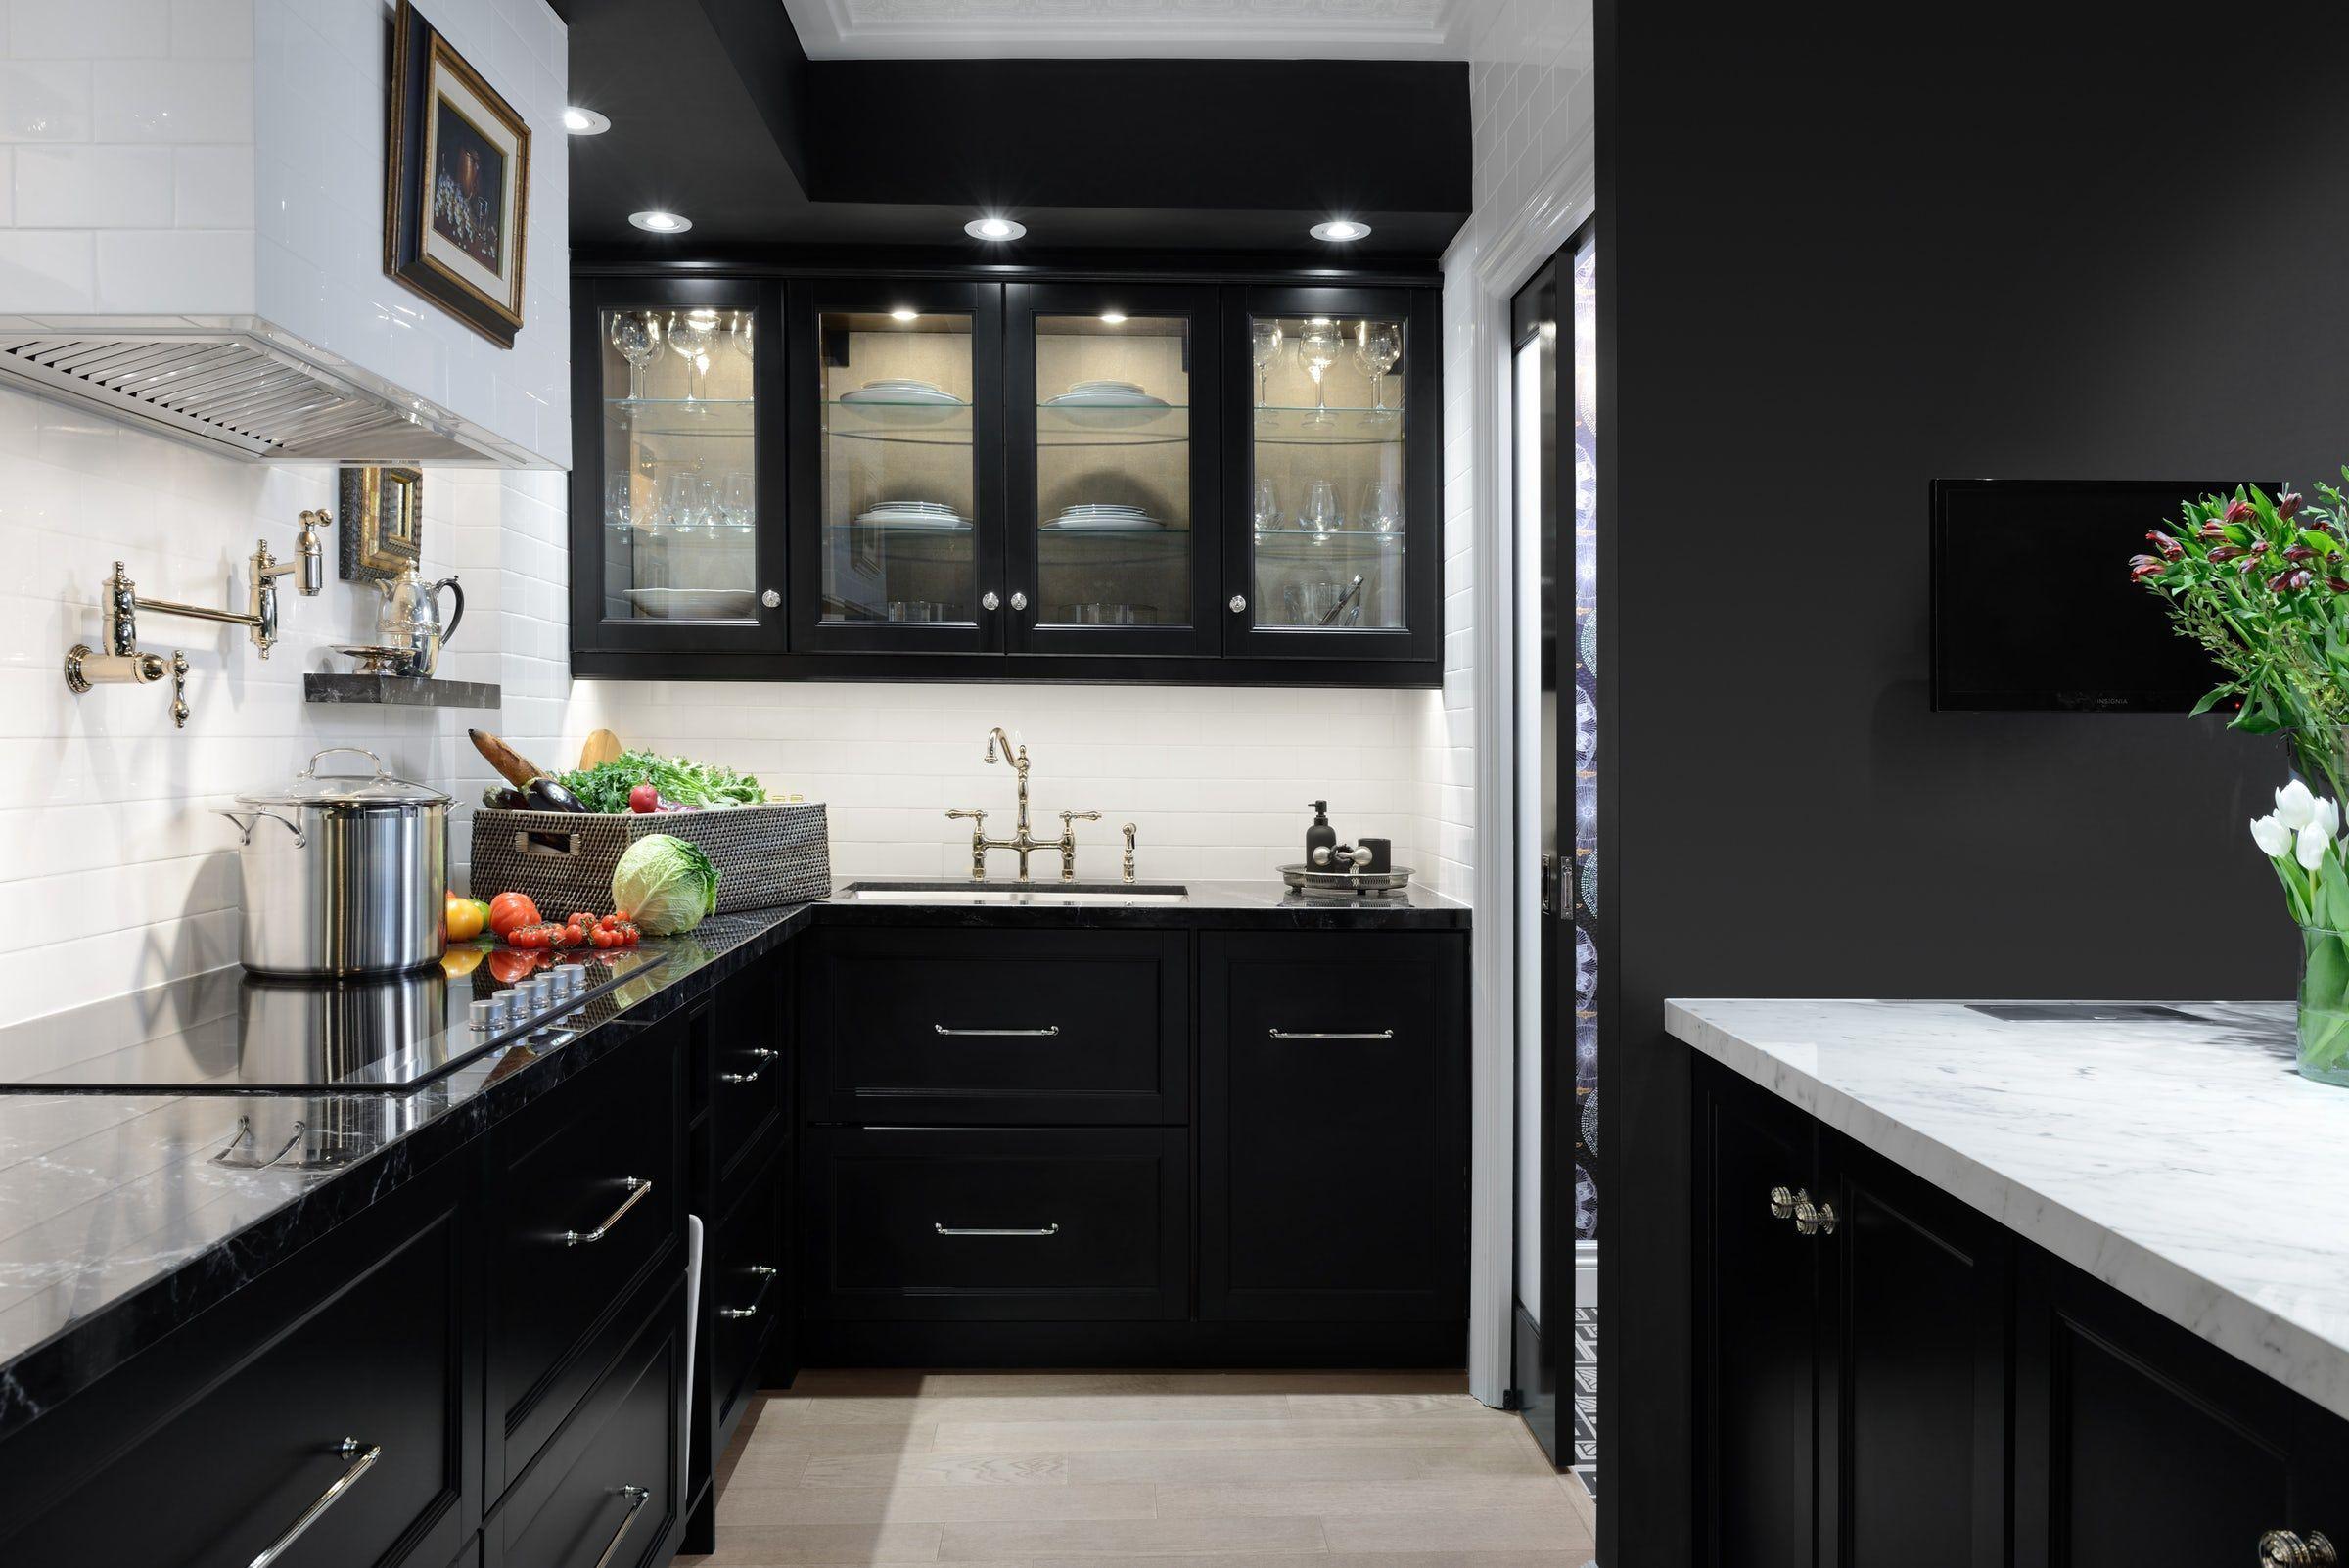 Kitchen Cabinet Trends For 2020 In 2020 Black Kitchen Cabinets Black Kitchens Modern Black Kitchen